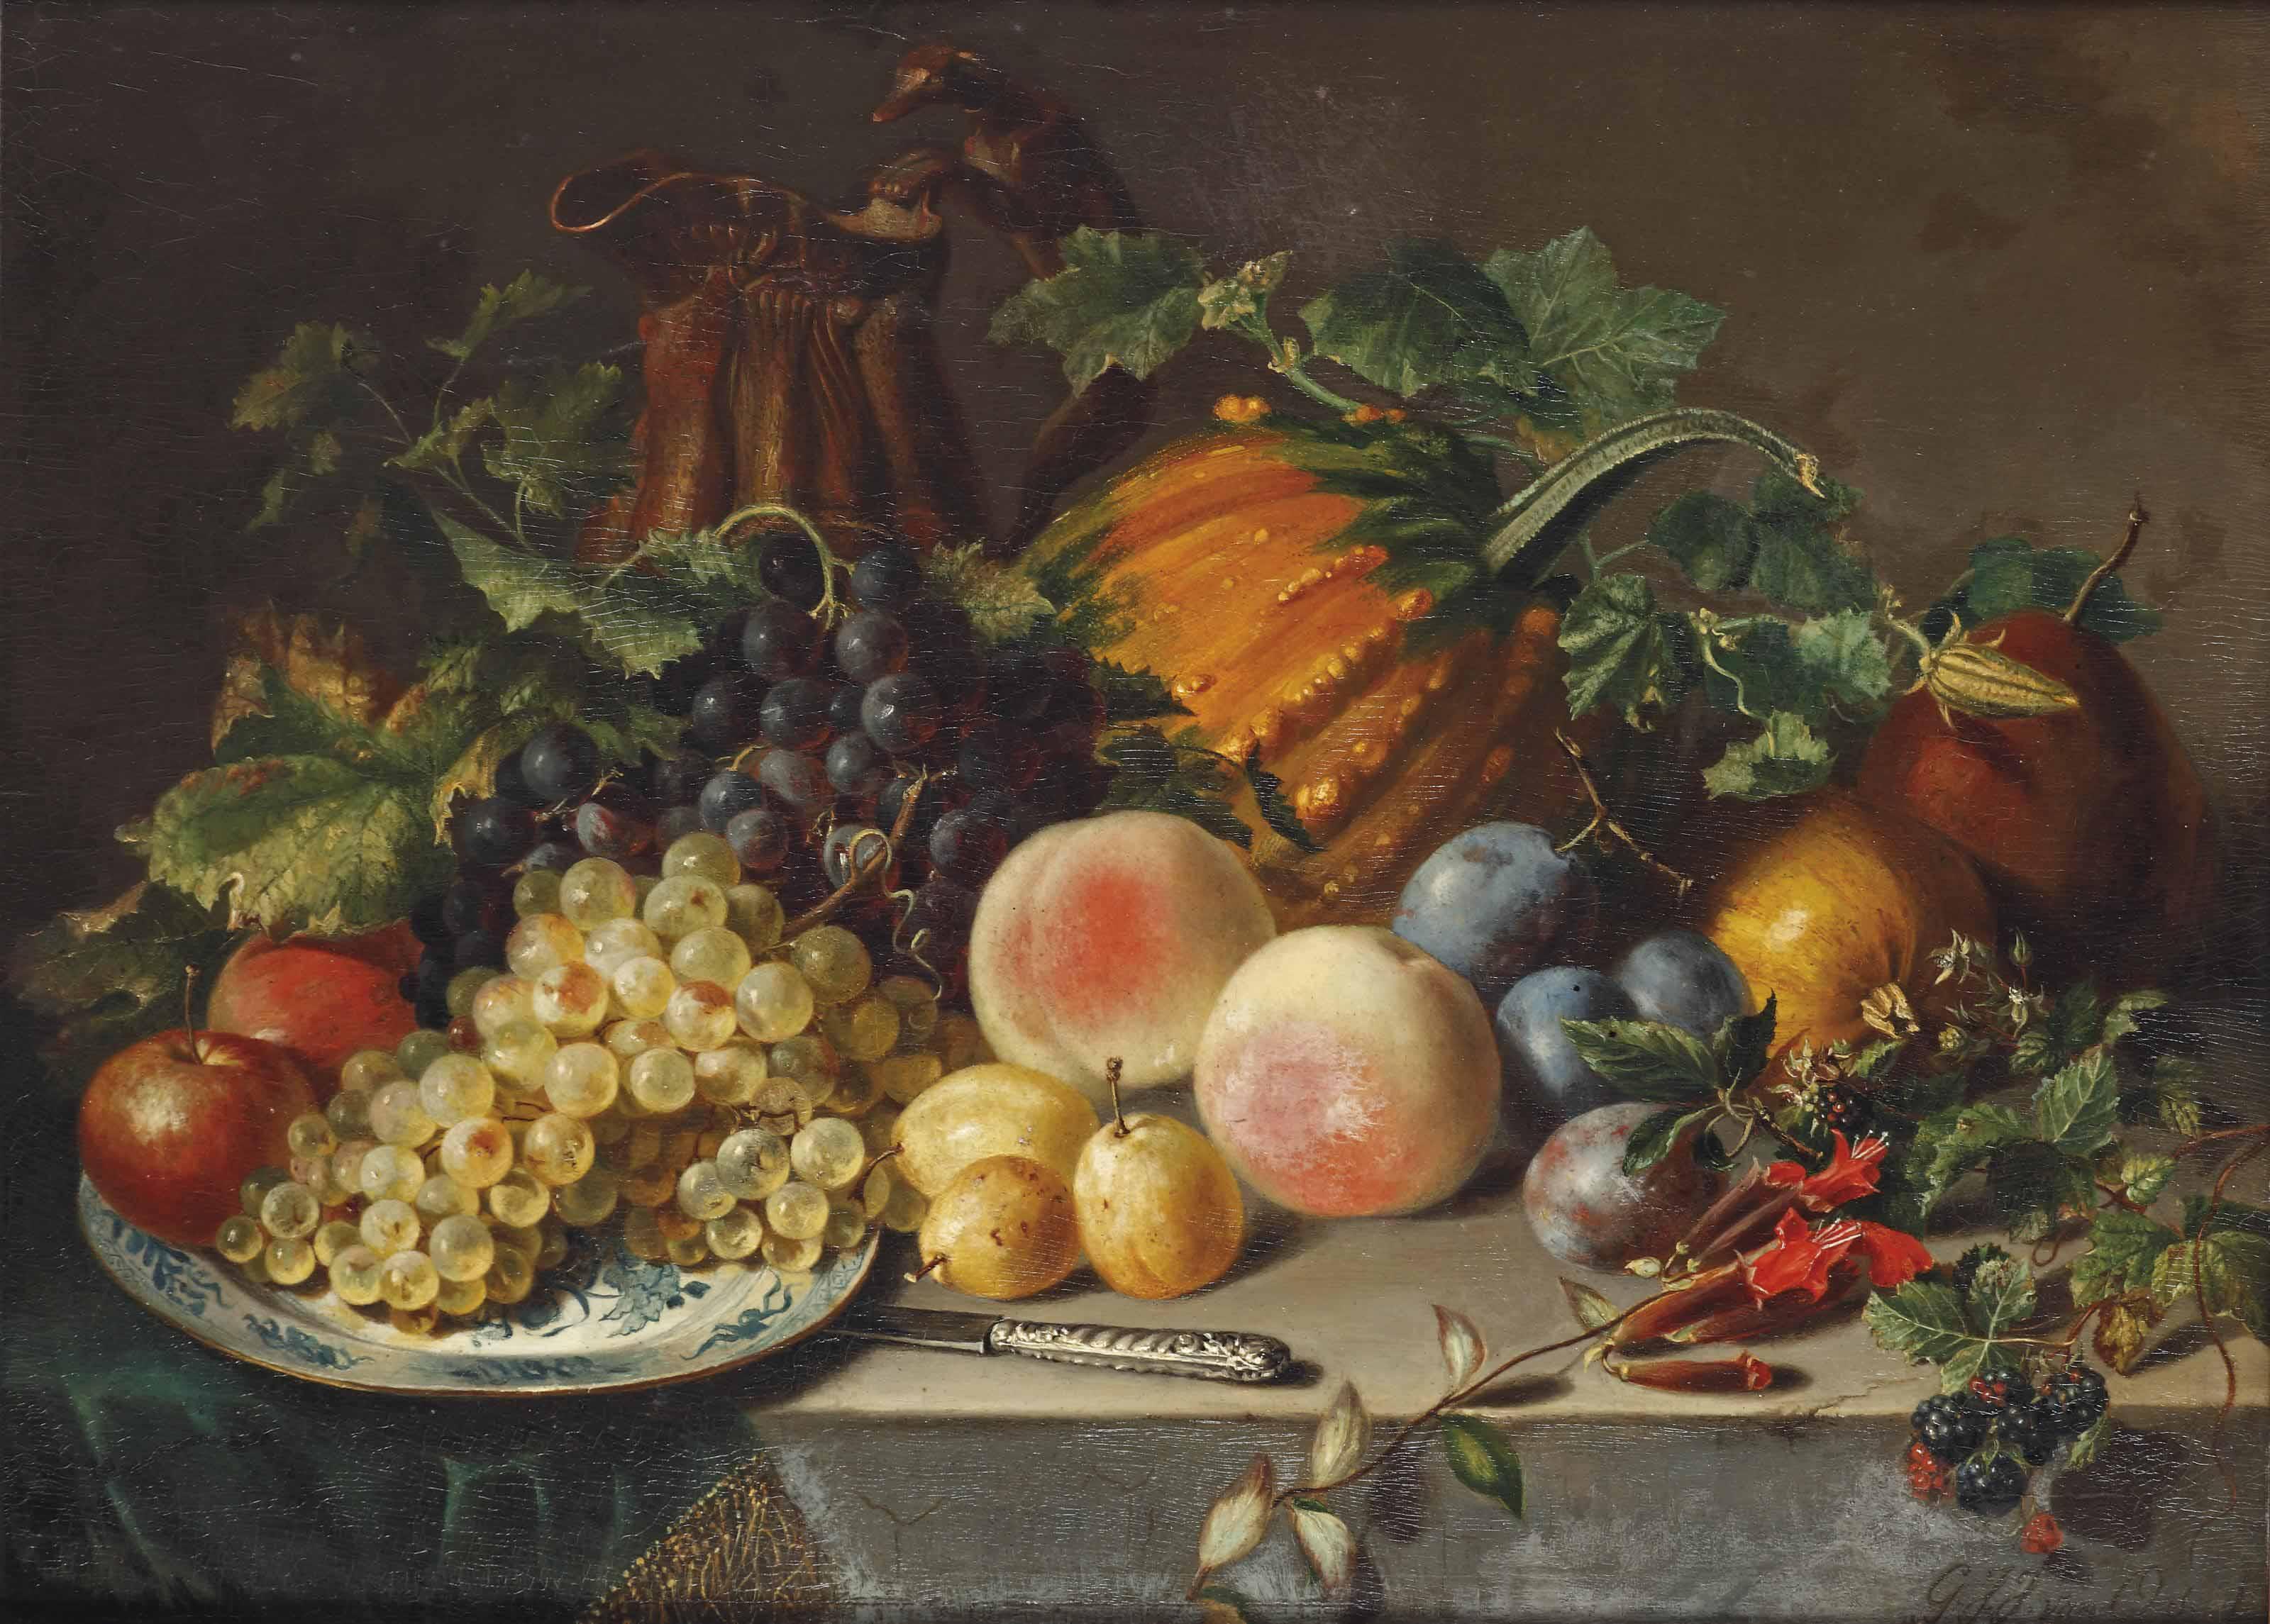 An abundant fruit still life with grapes, apples, peaches, prunes and a pumpkin